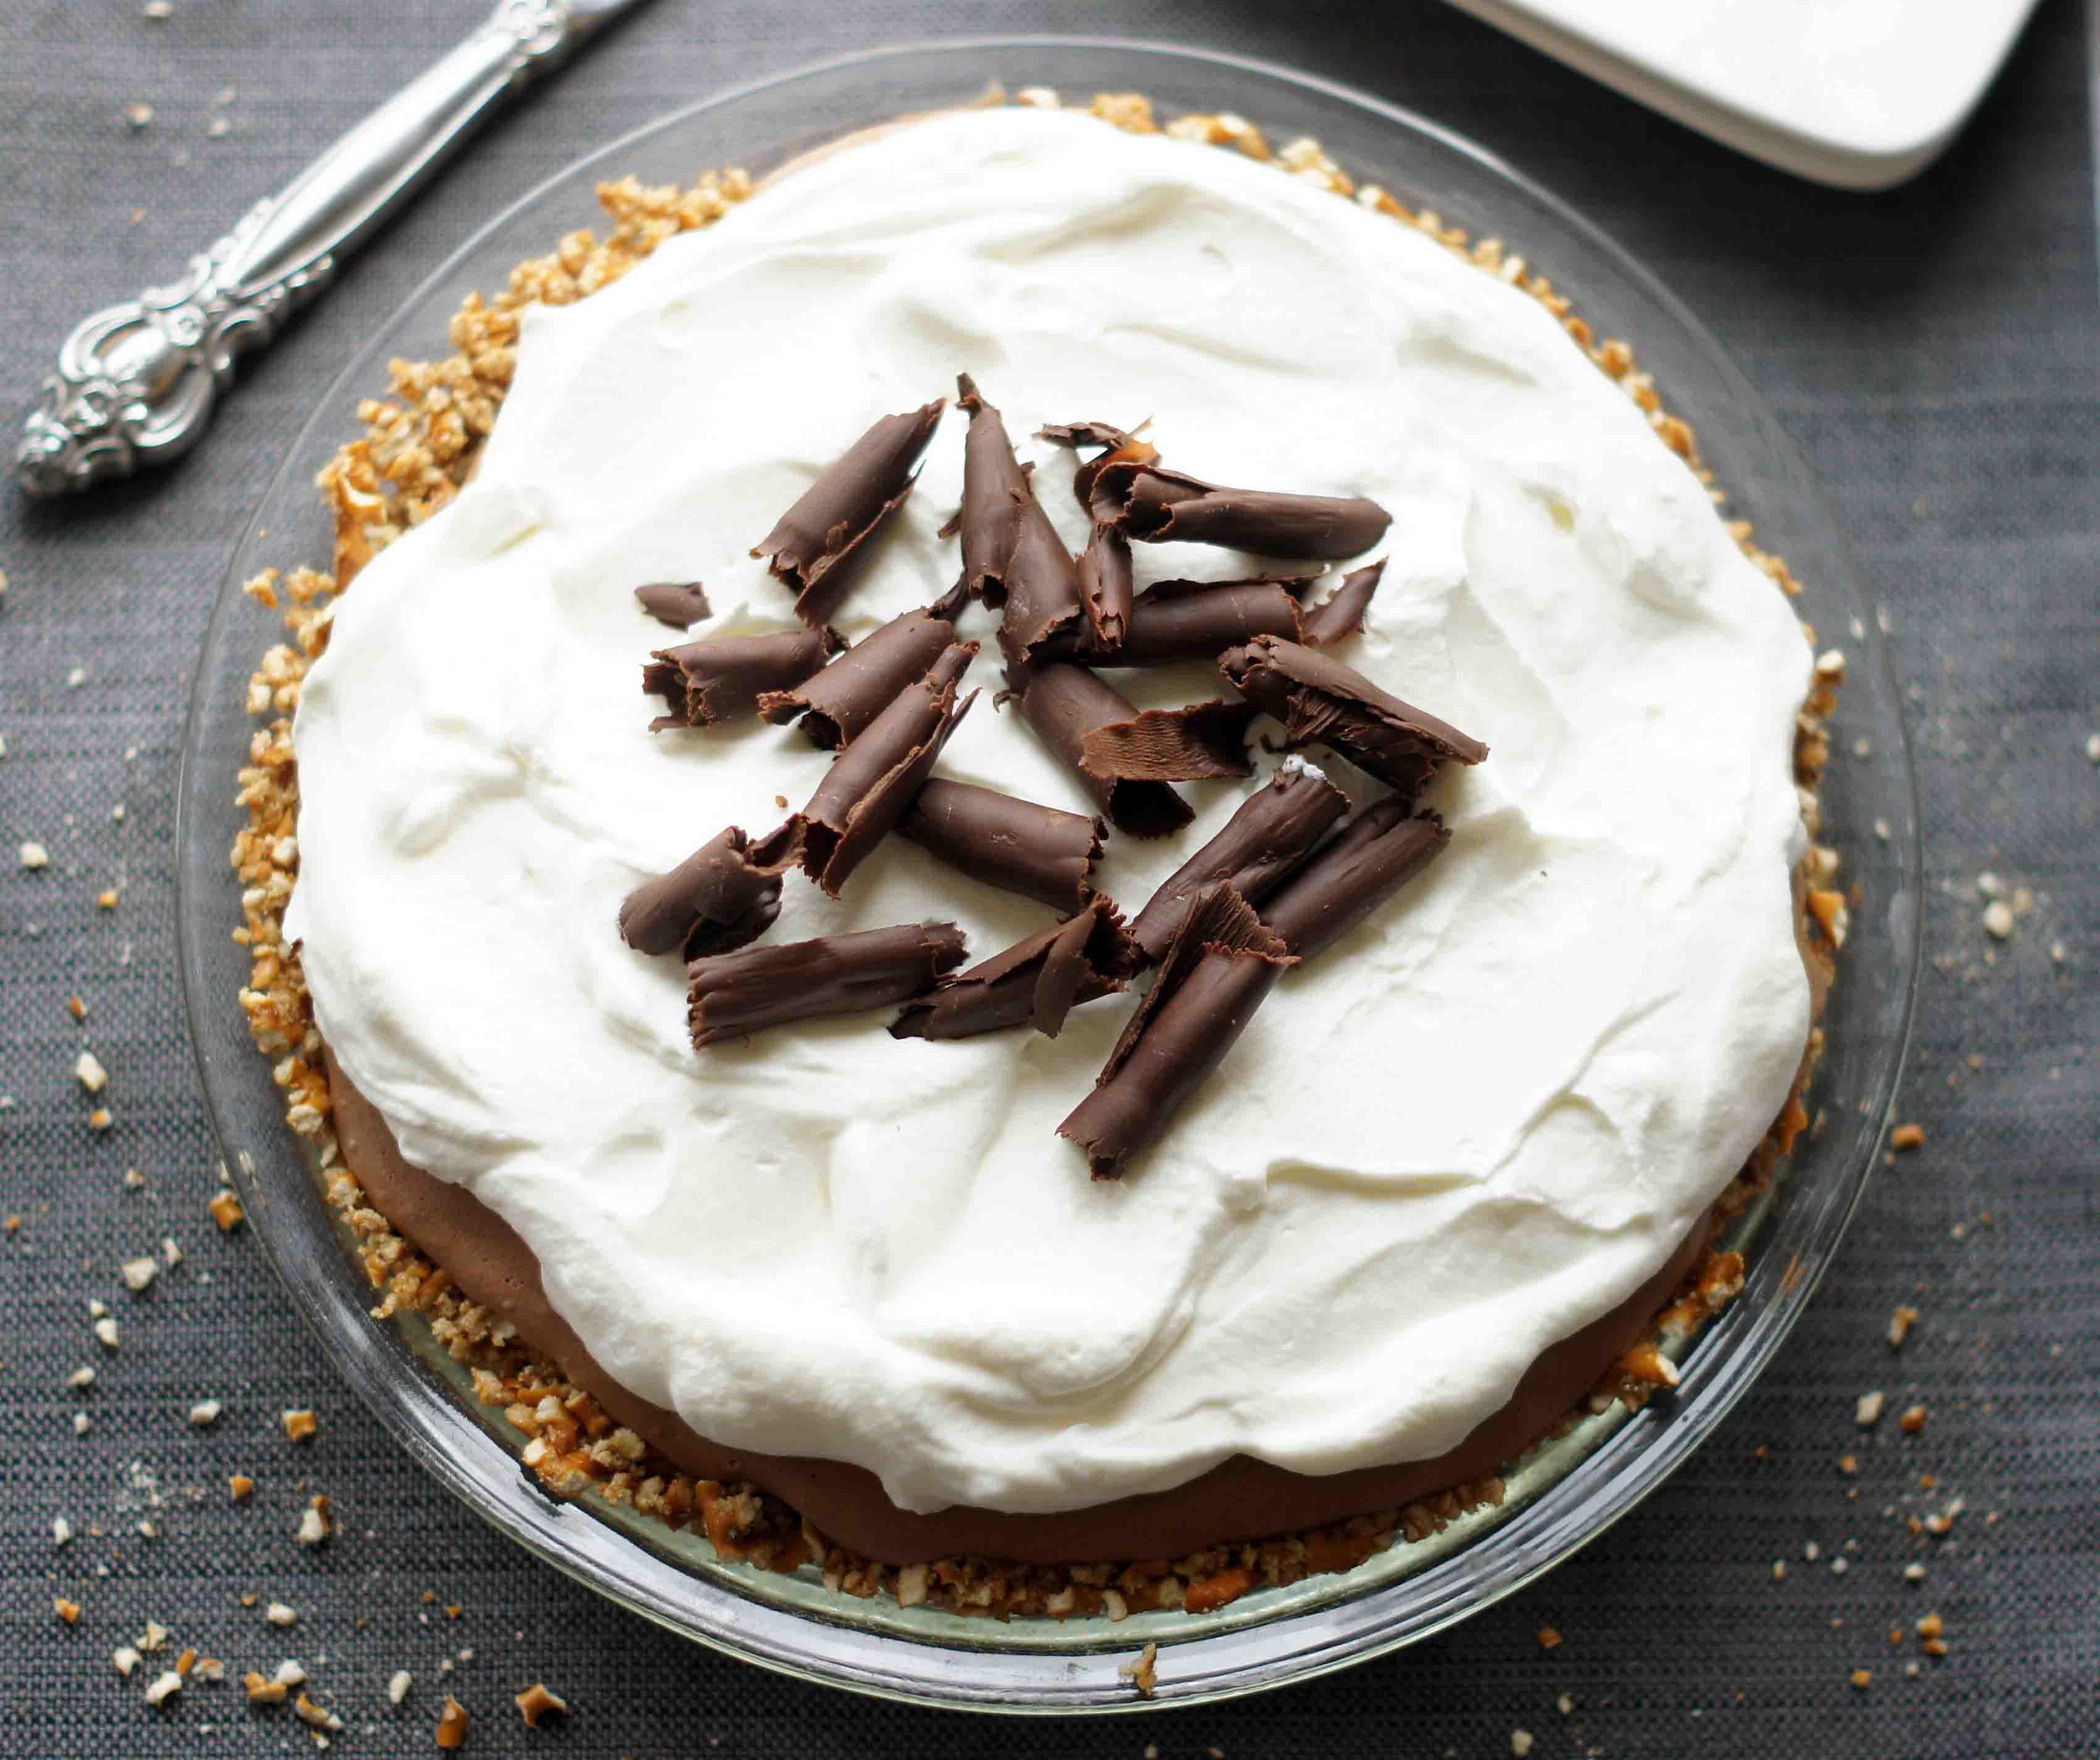 Chocolate Mousse Pie with Pretzel Crust - 5BoysBaker